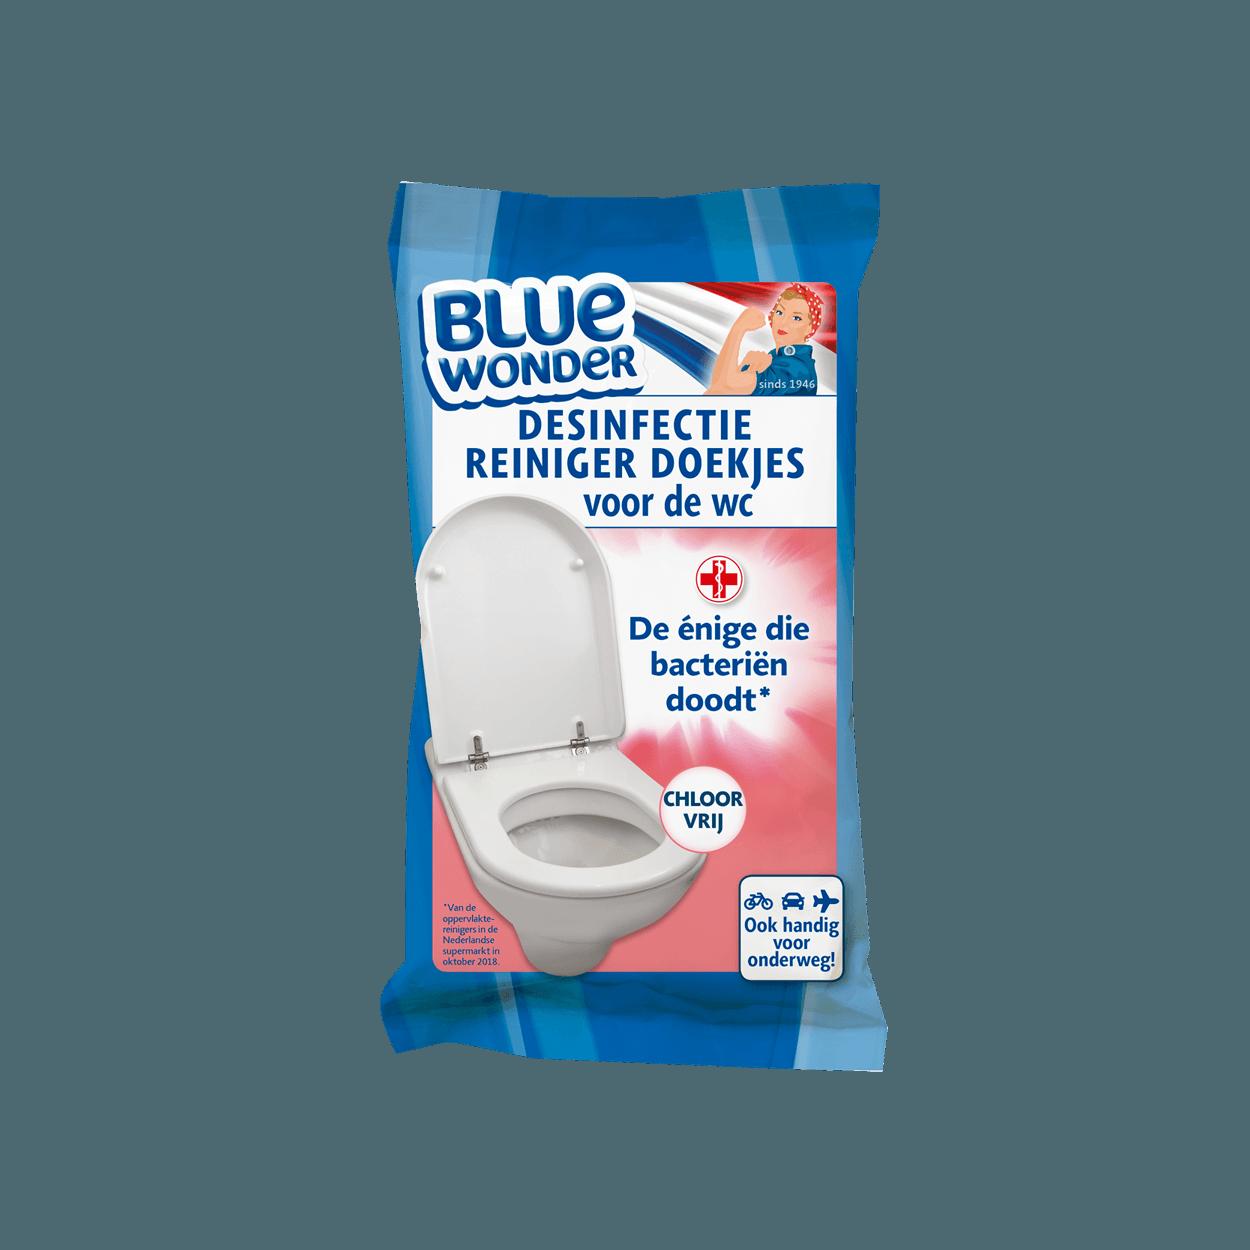 8712038001608-_Blue-Wonder_Desinfectie-reiniger-doekjes_front